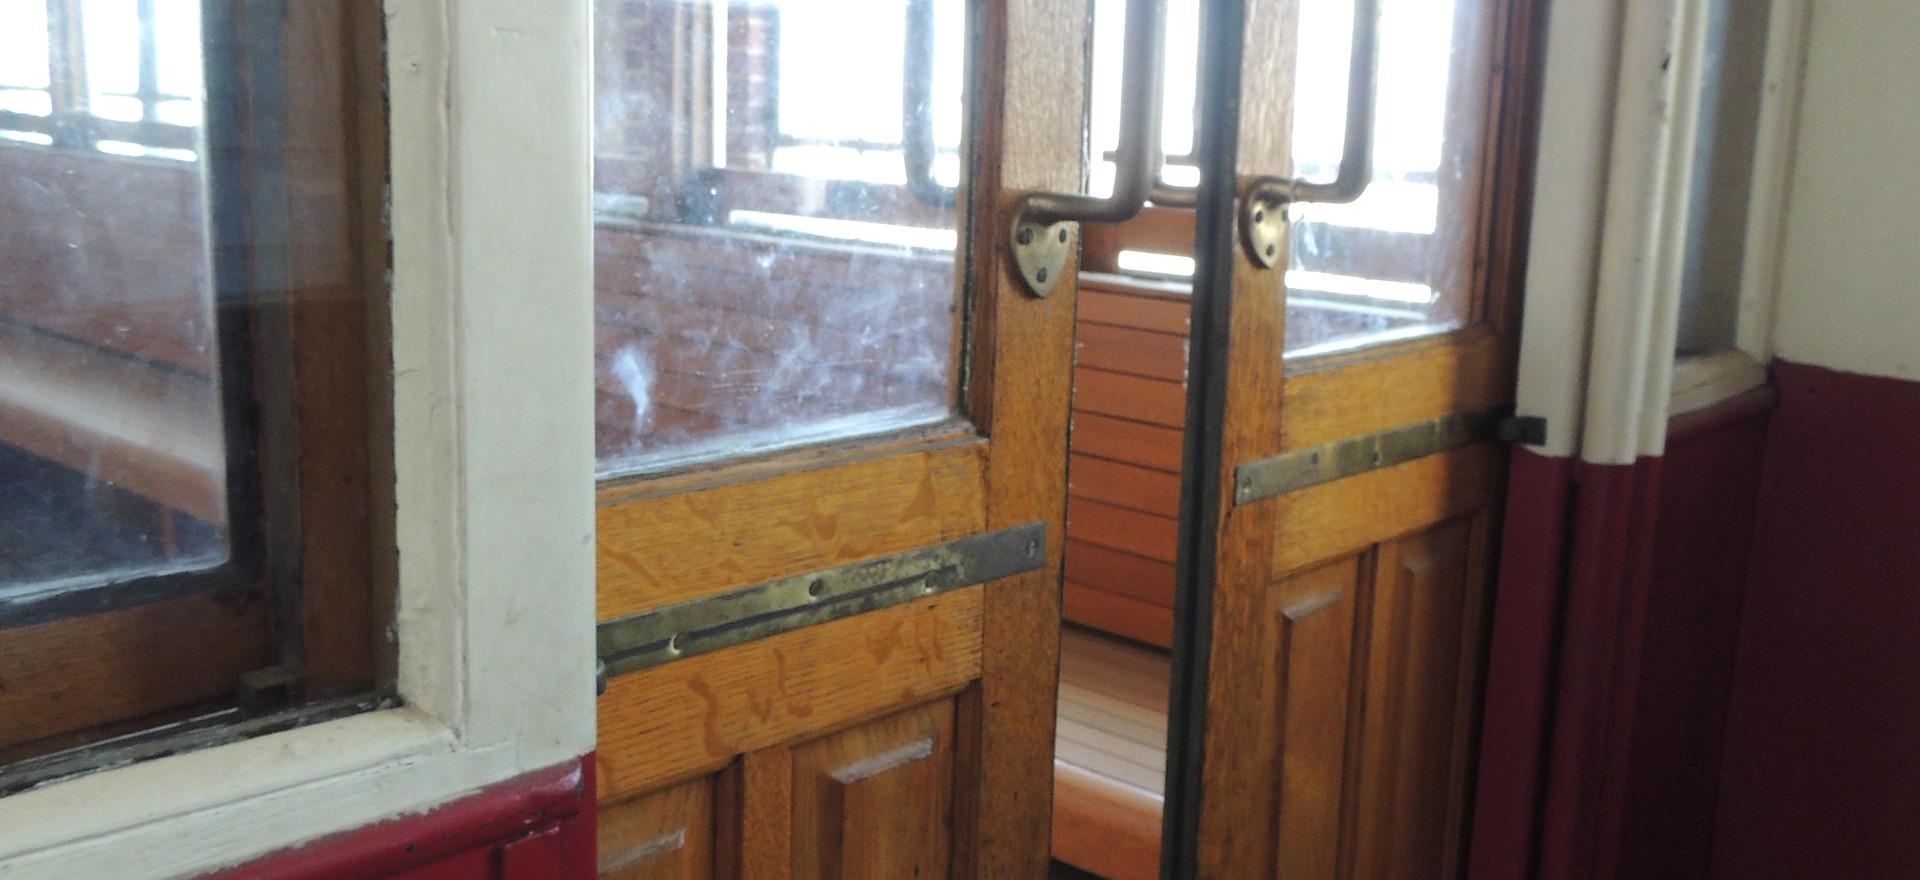 Sliding Doors on Trolley Car #1